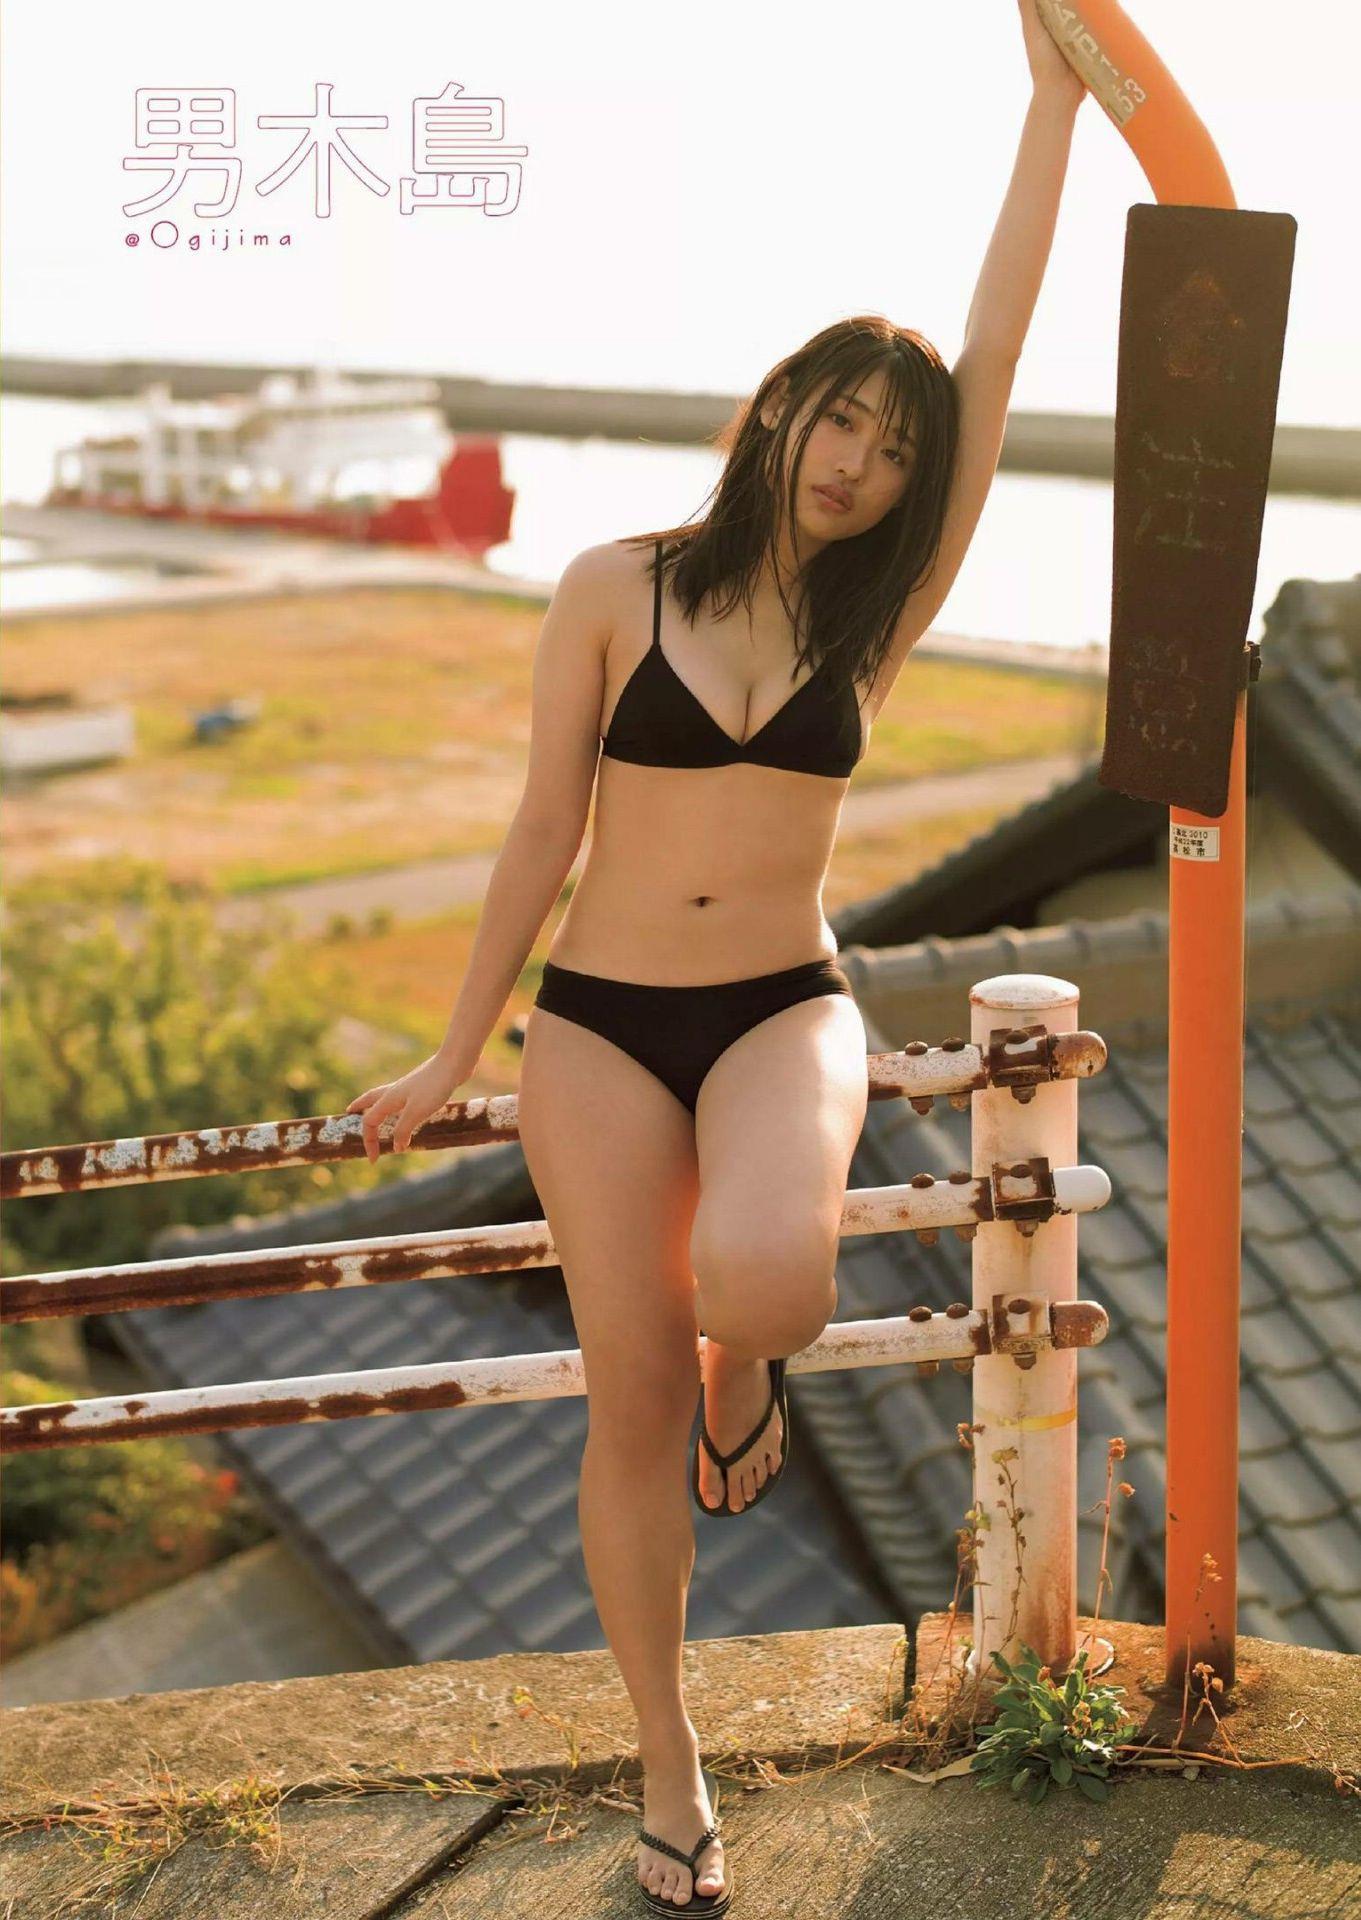 Weekly Playboy 2019-12-22_imgs-0005a